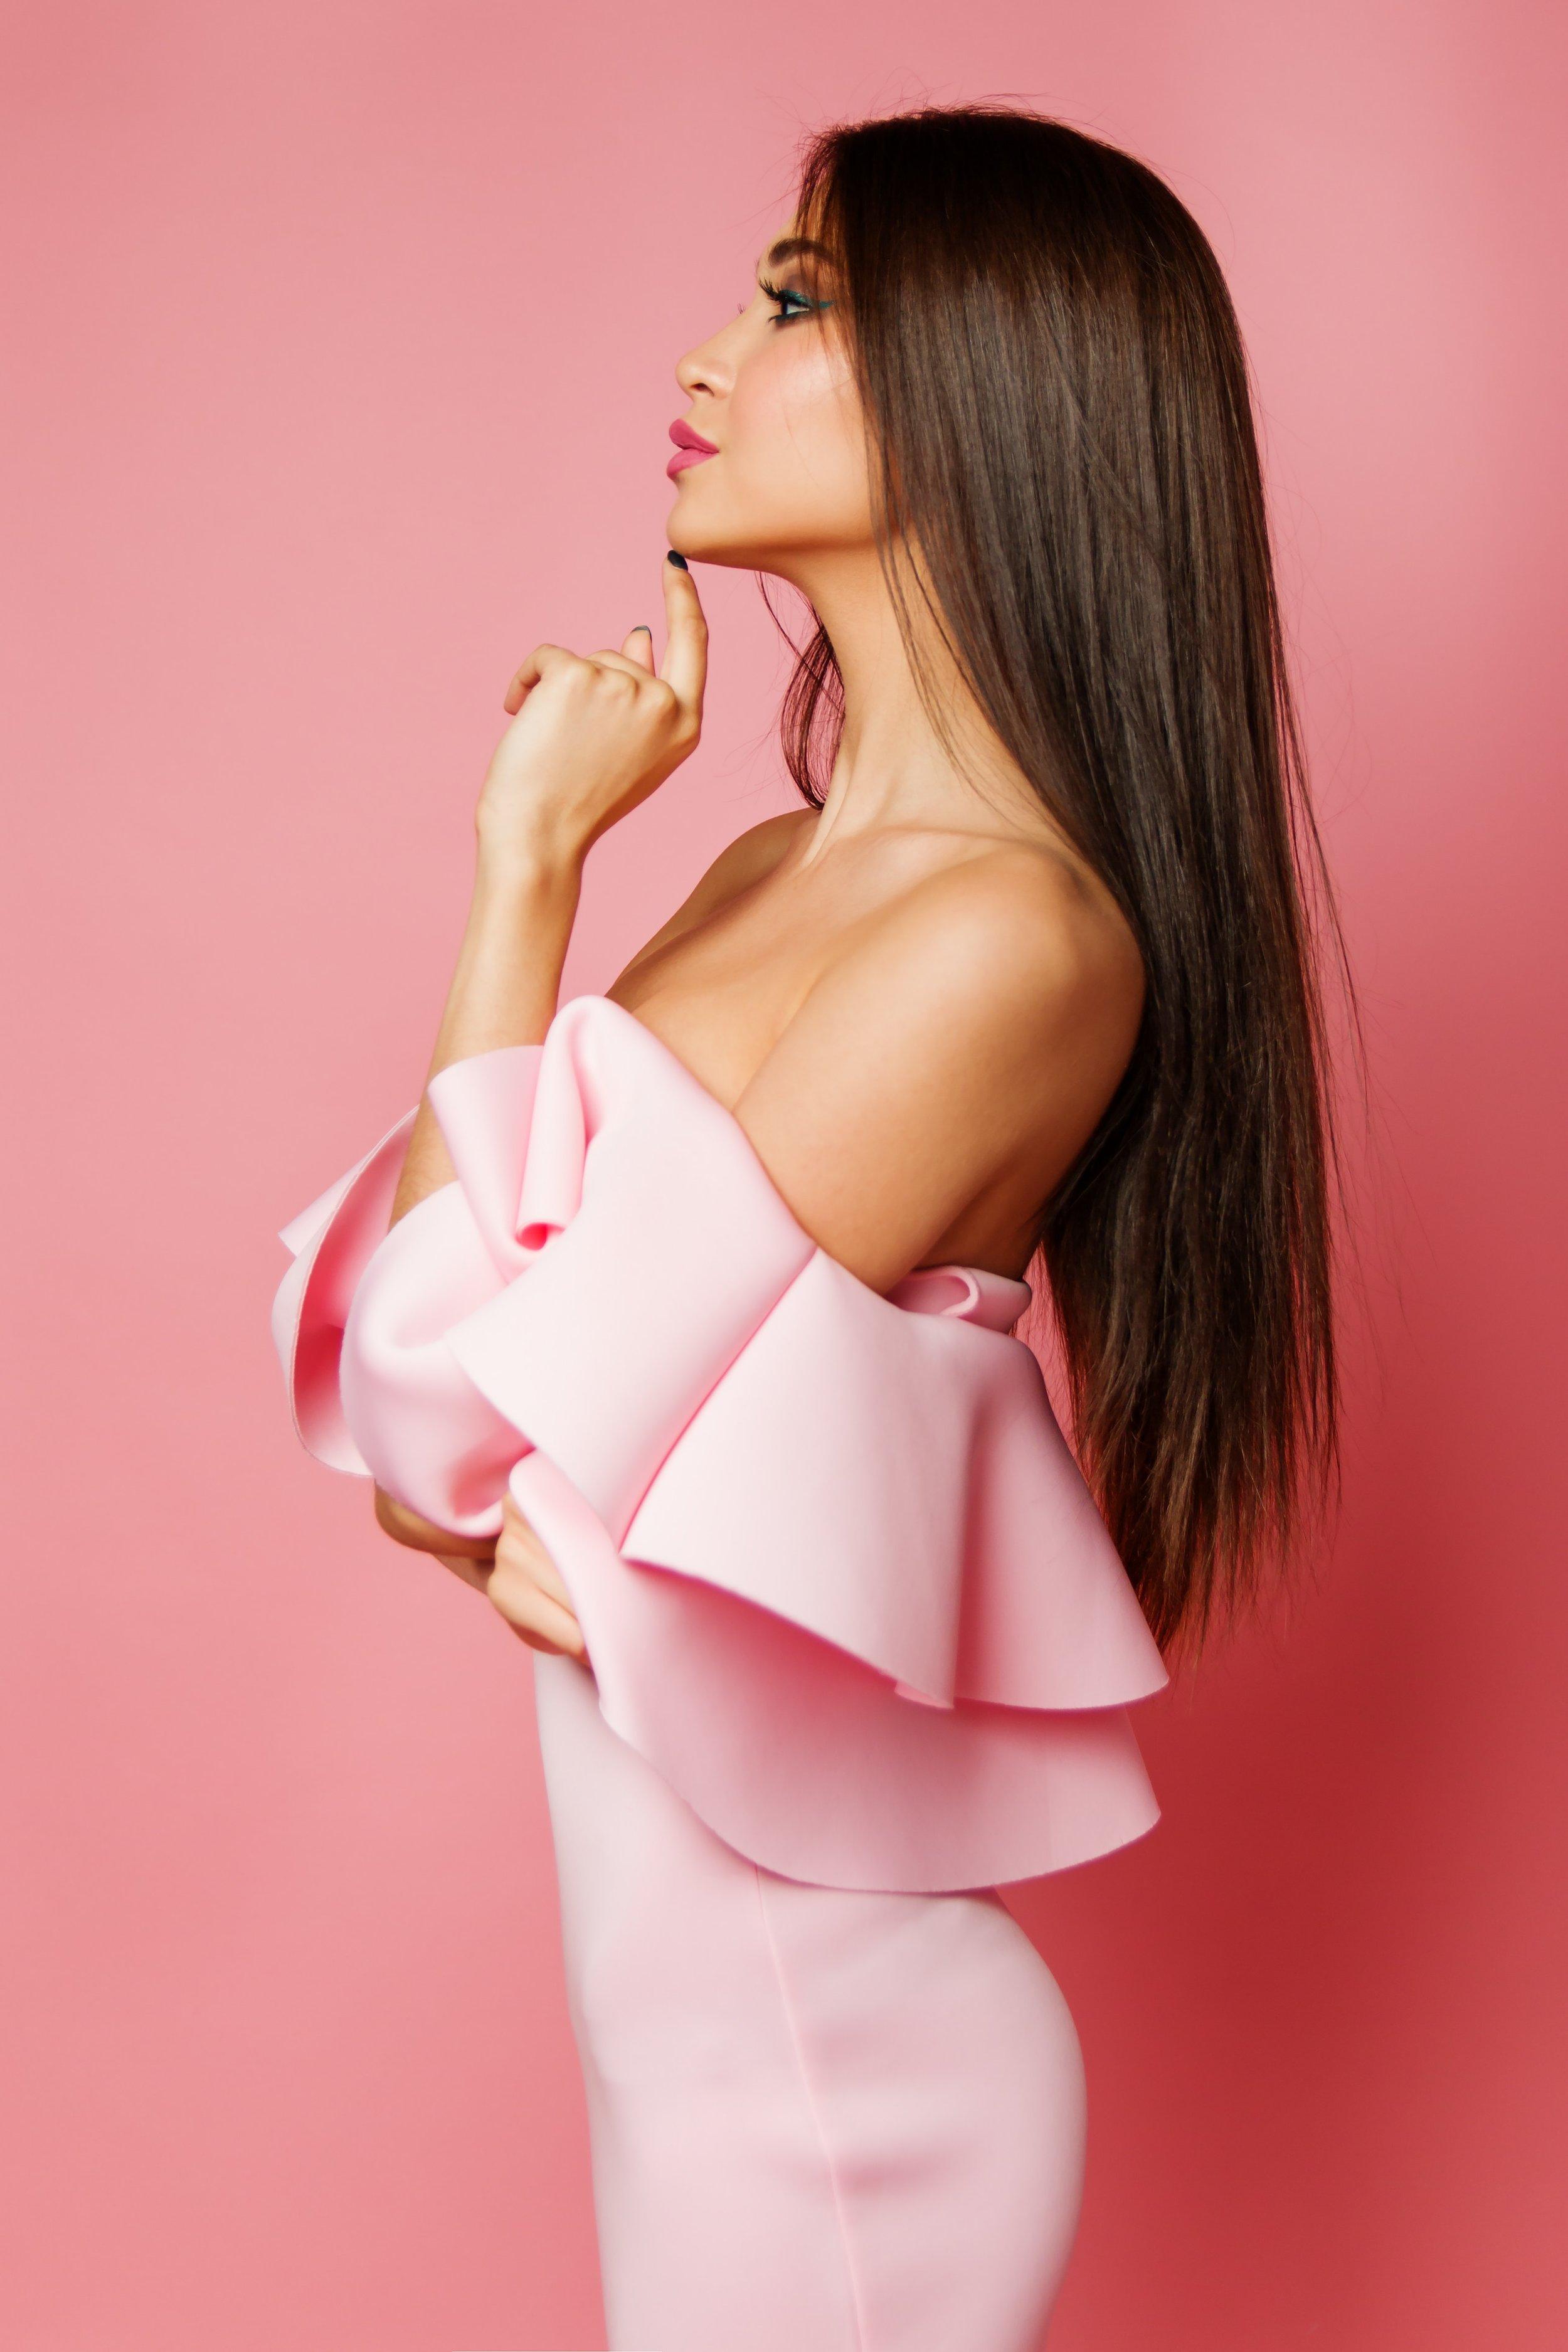 dress-elegant-fashion-2065195.jpg